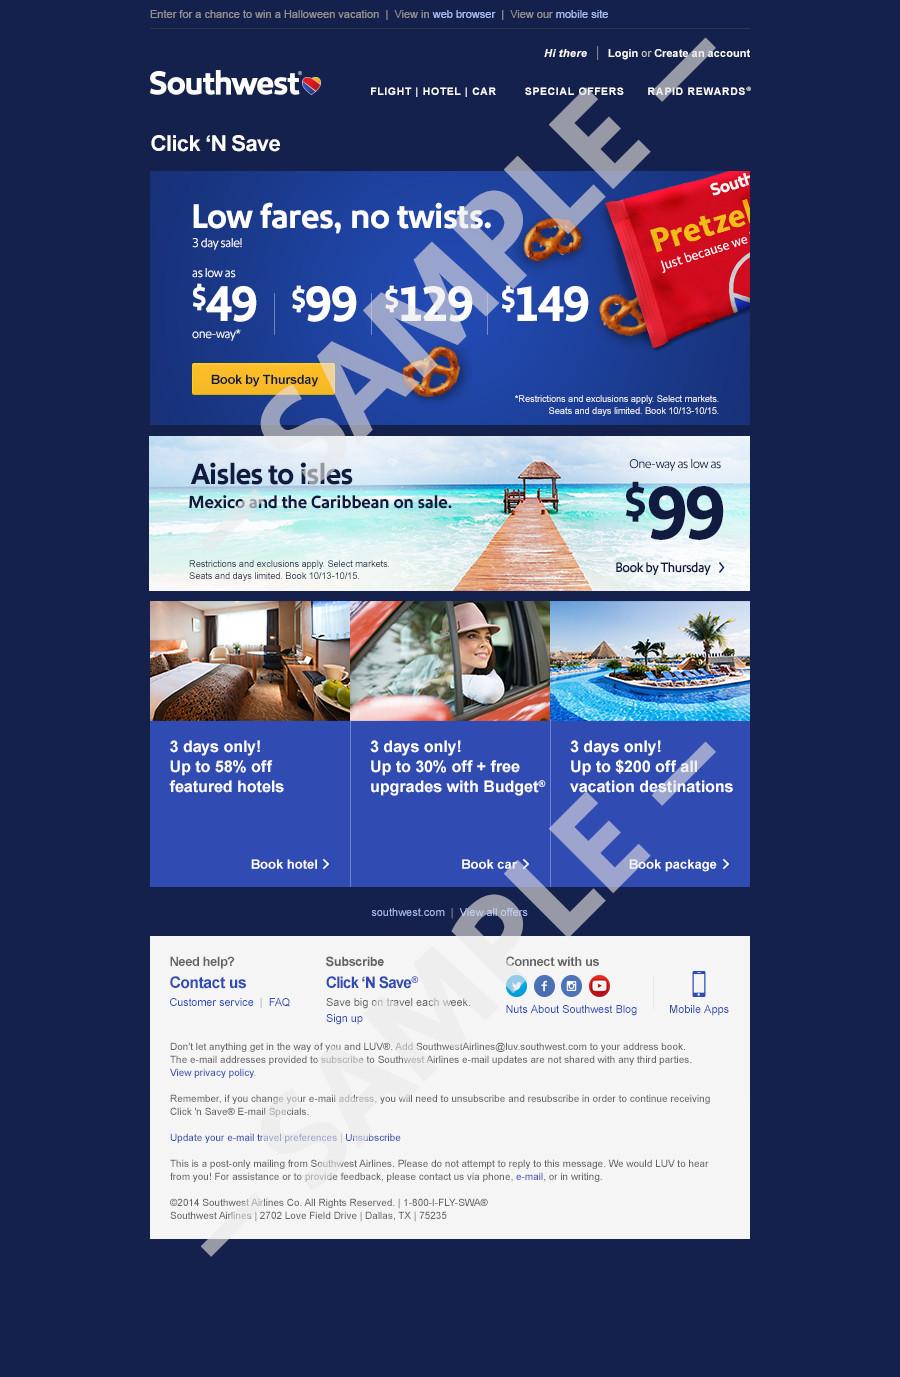 Muestra de Click &#39;N Save<sup>®</sup>